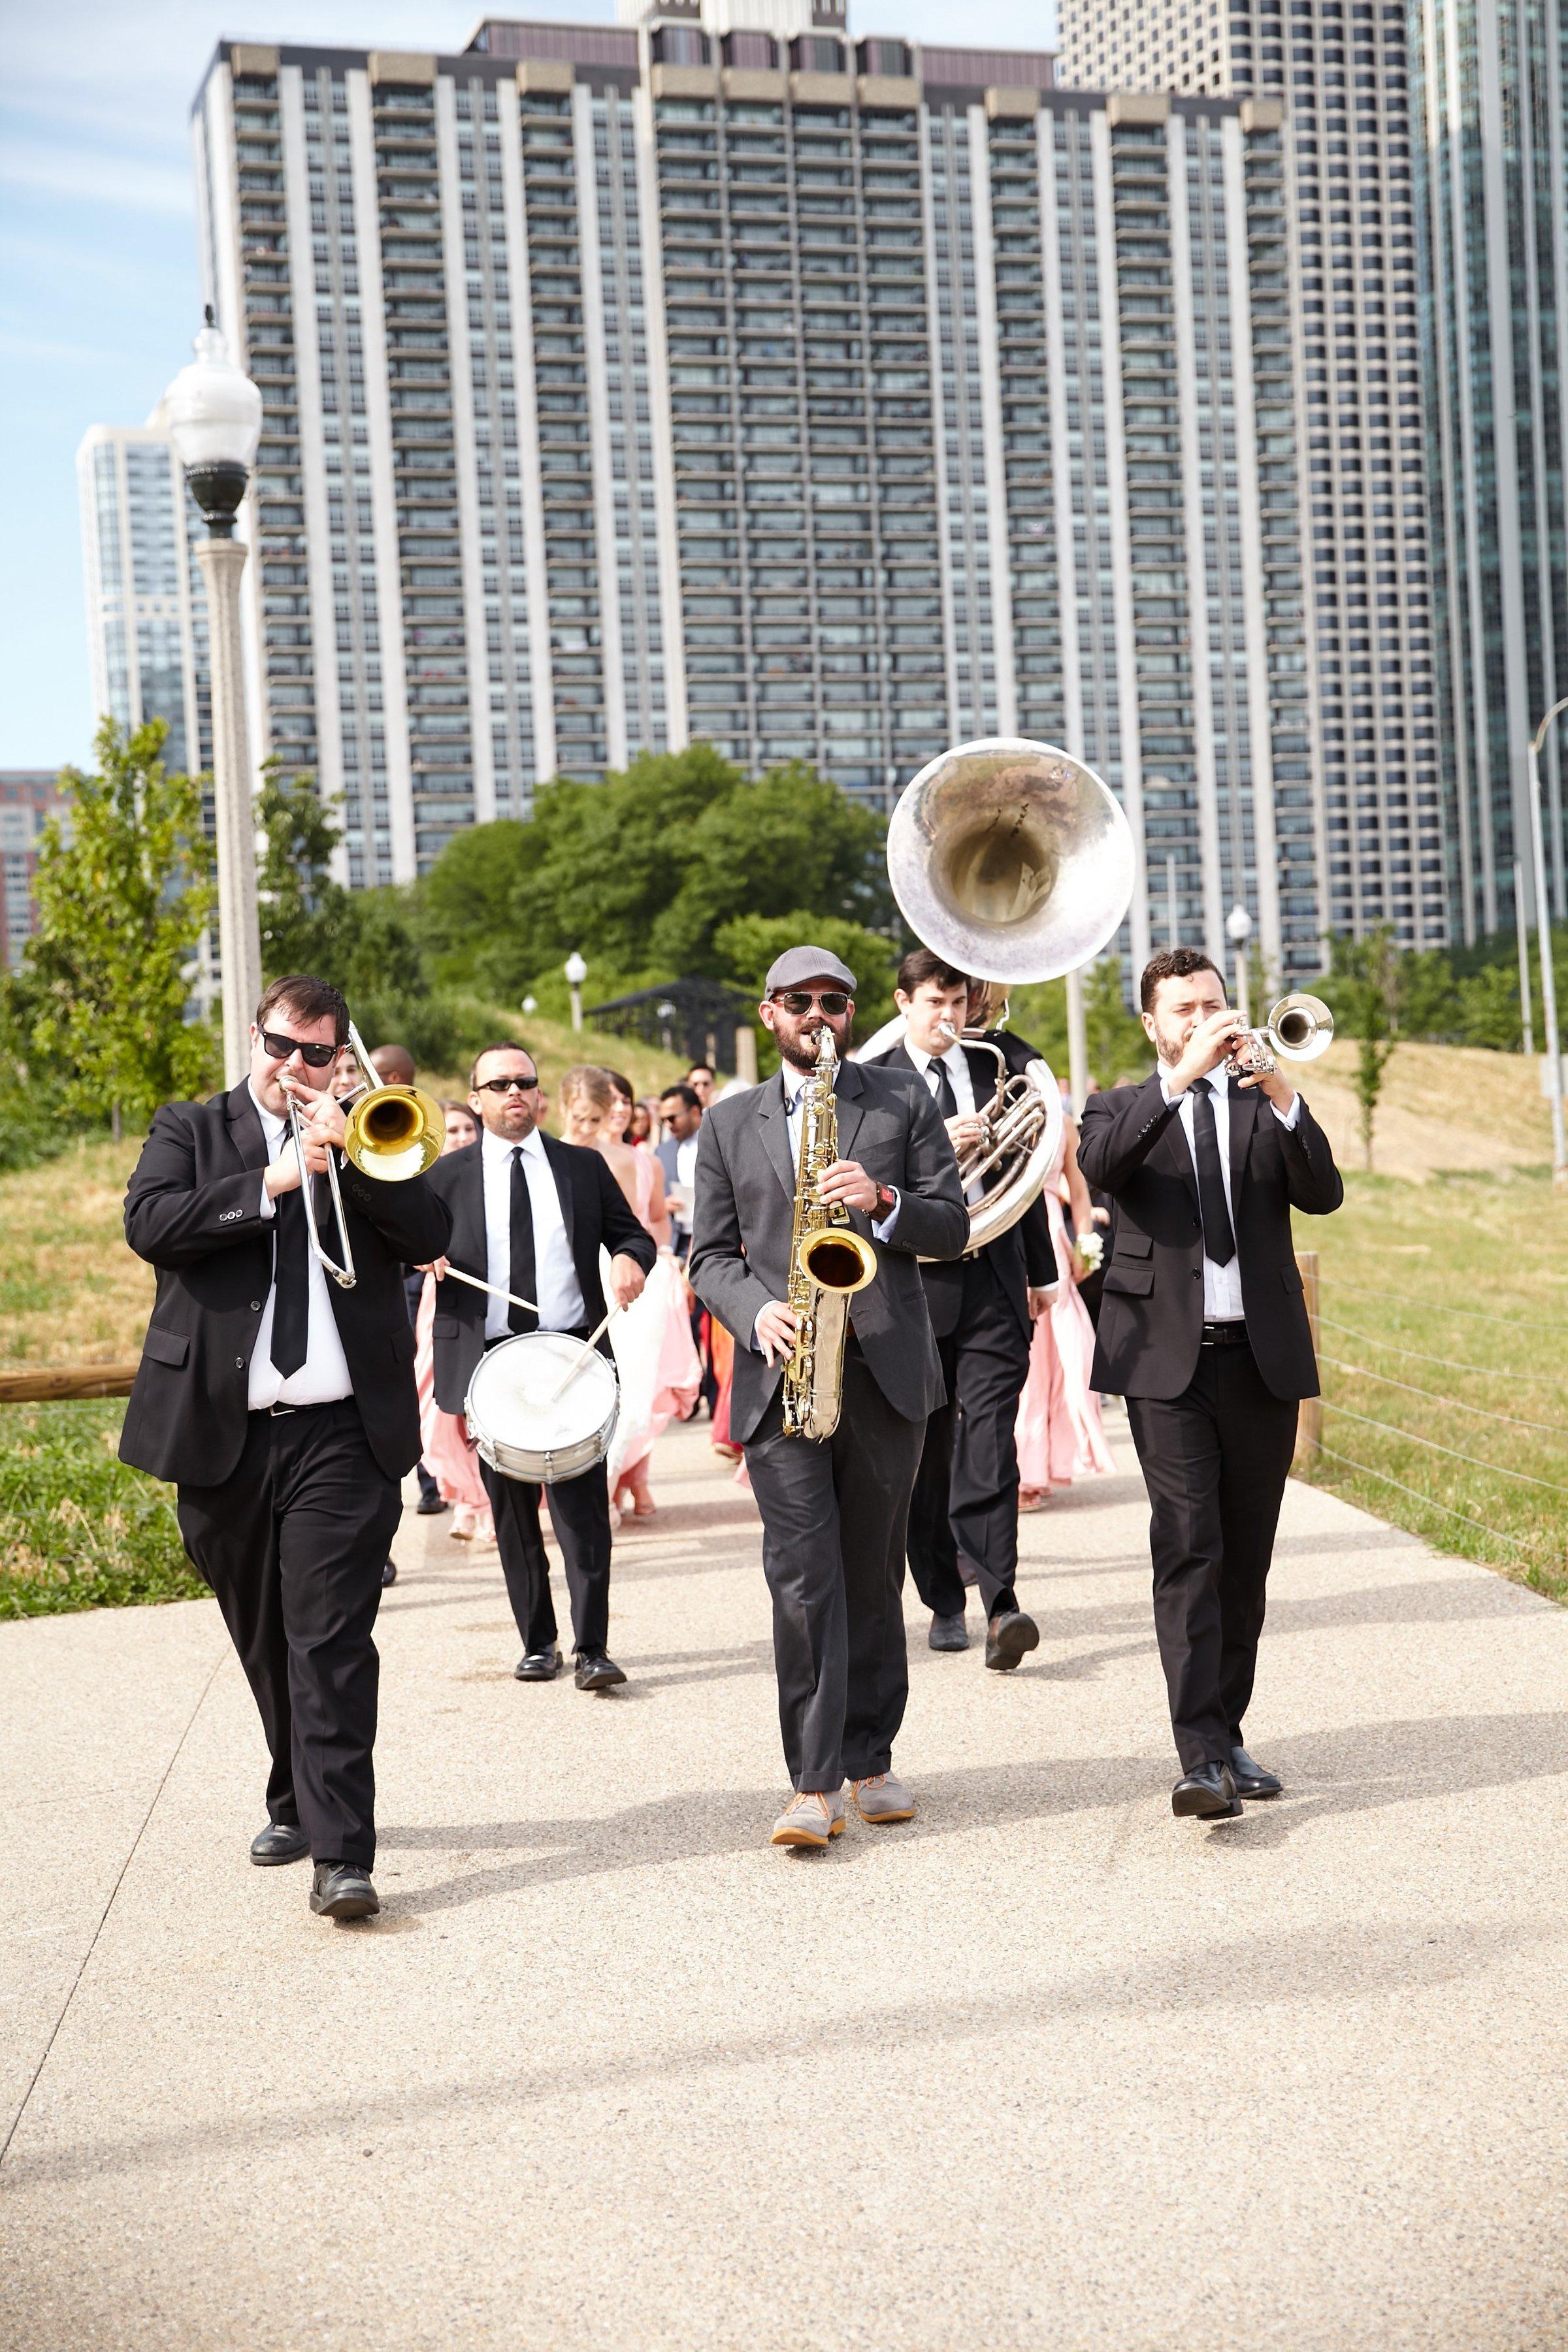 wedding band, Cancer Survivor Park, Wrap It Up Parties